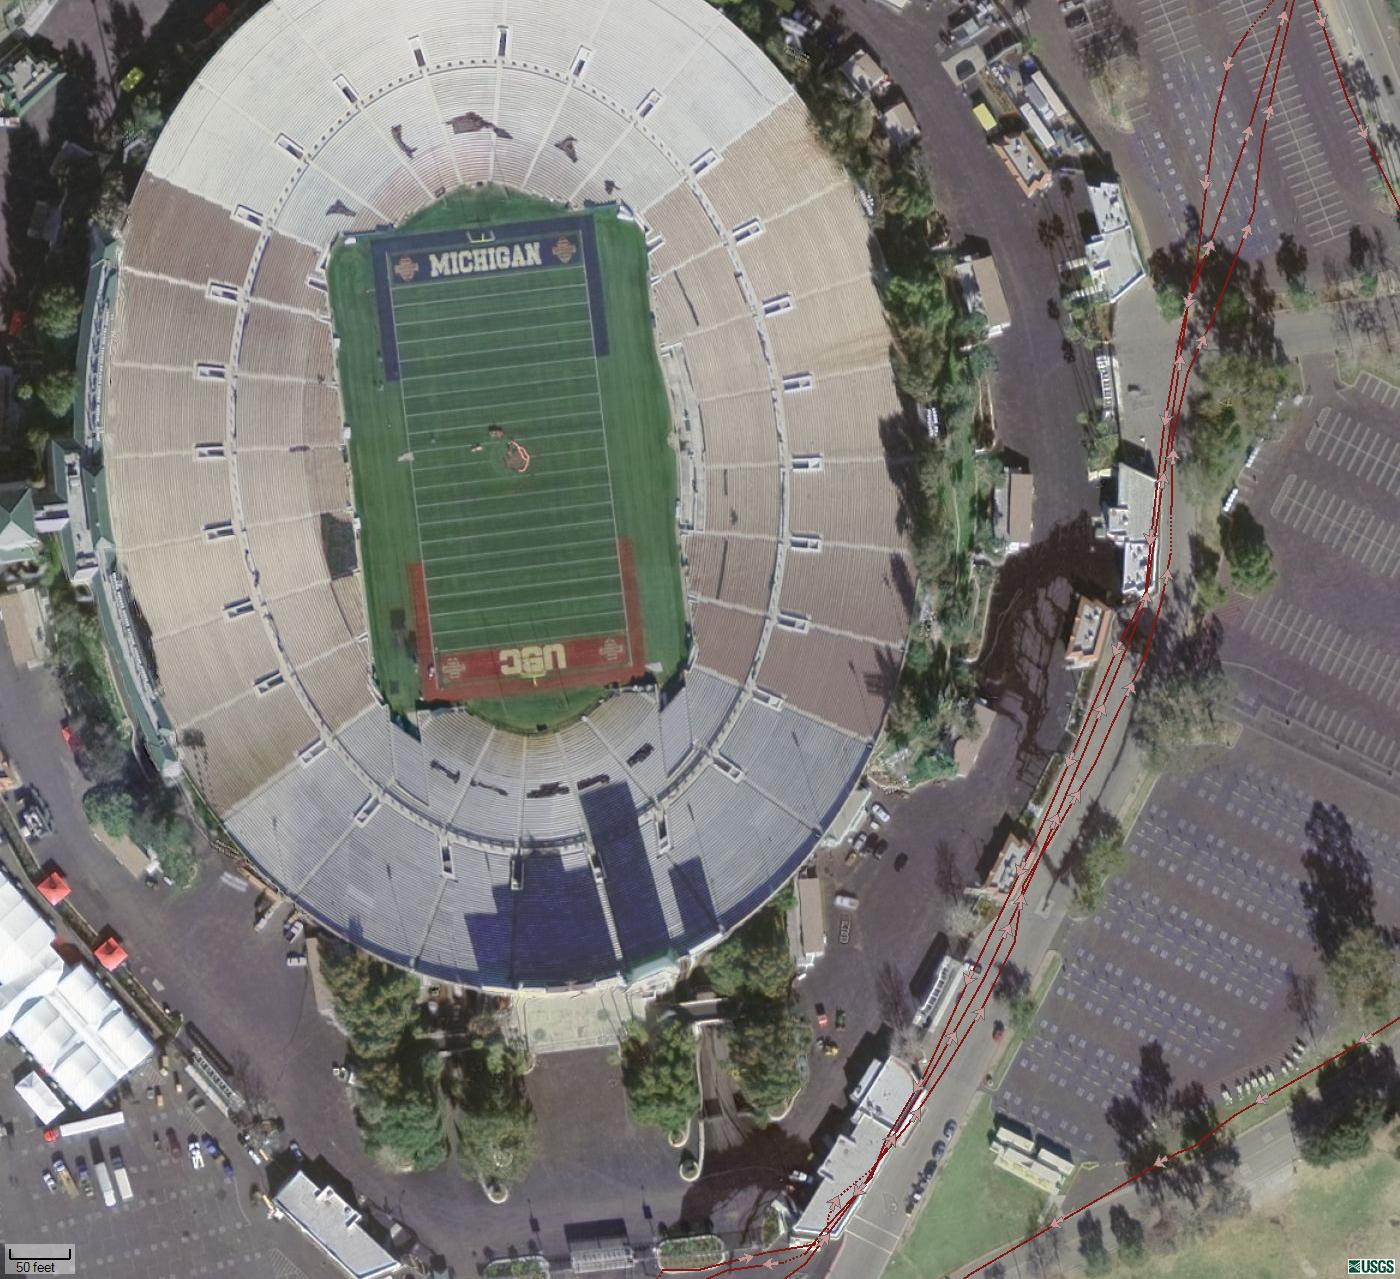 Hills__Pasadena_Rose_Bowl_562006.jpg